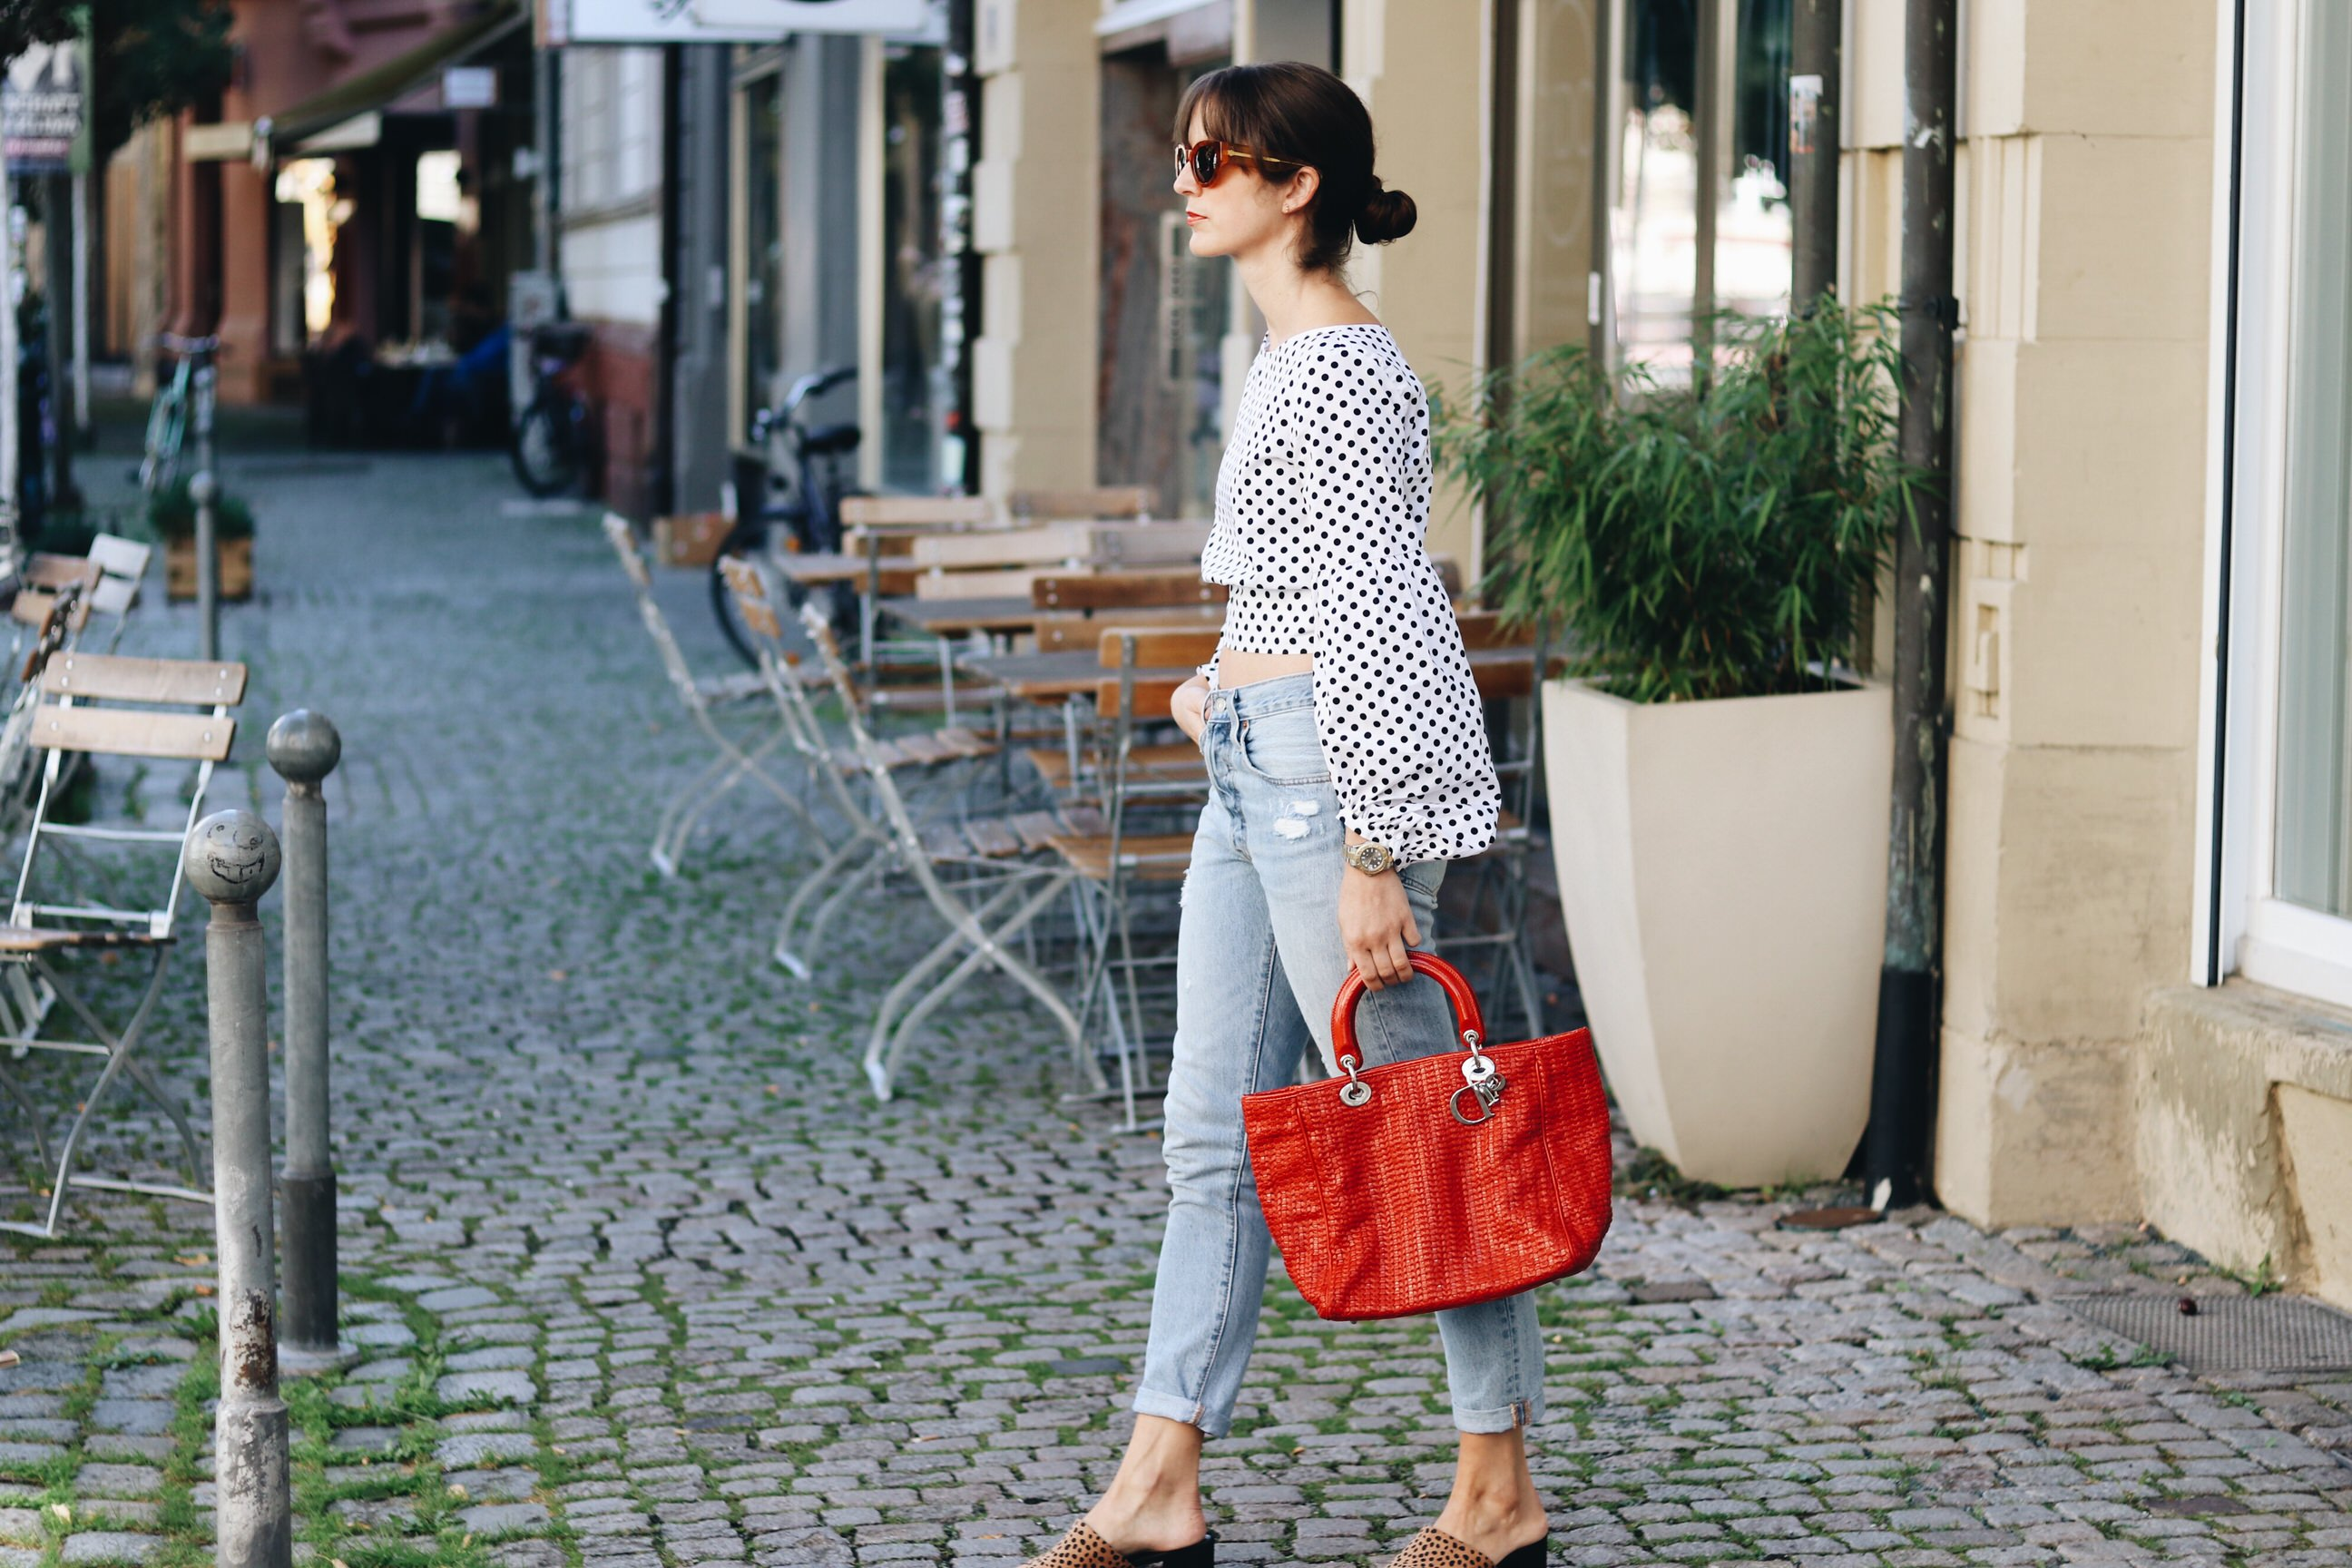 Polkadots-Punktemuster-Modetrends-Herbst-Winter-2017-Punkte-Mom-Jeans-Mules-Leo-Print-Celine-Sonnenbrille-Dior-Bag-Rueckenfrei-Rueckenausschnitt-Herbstlook